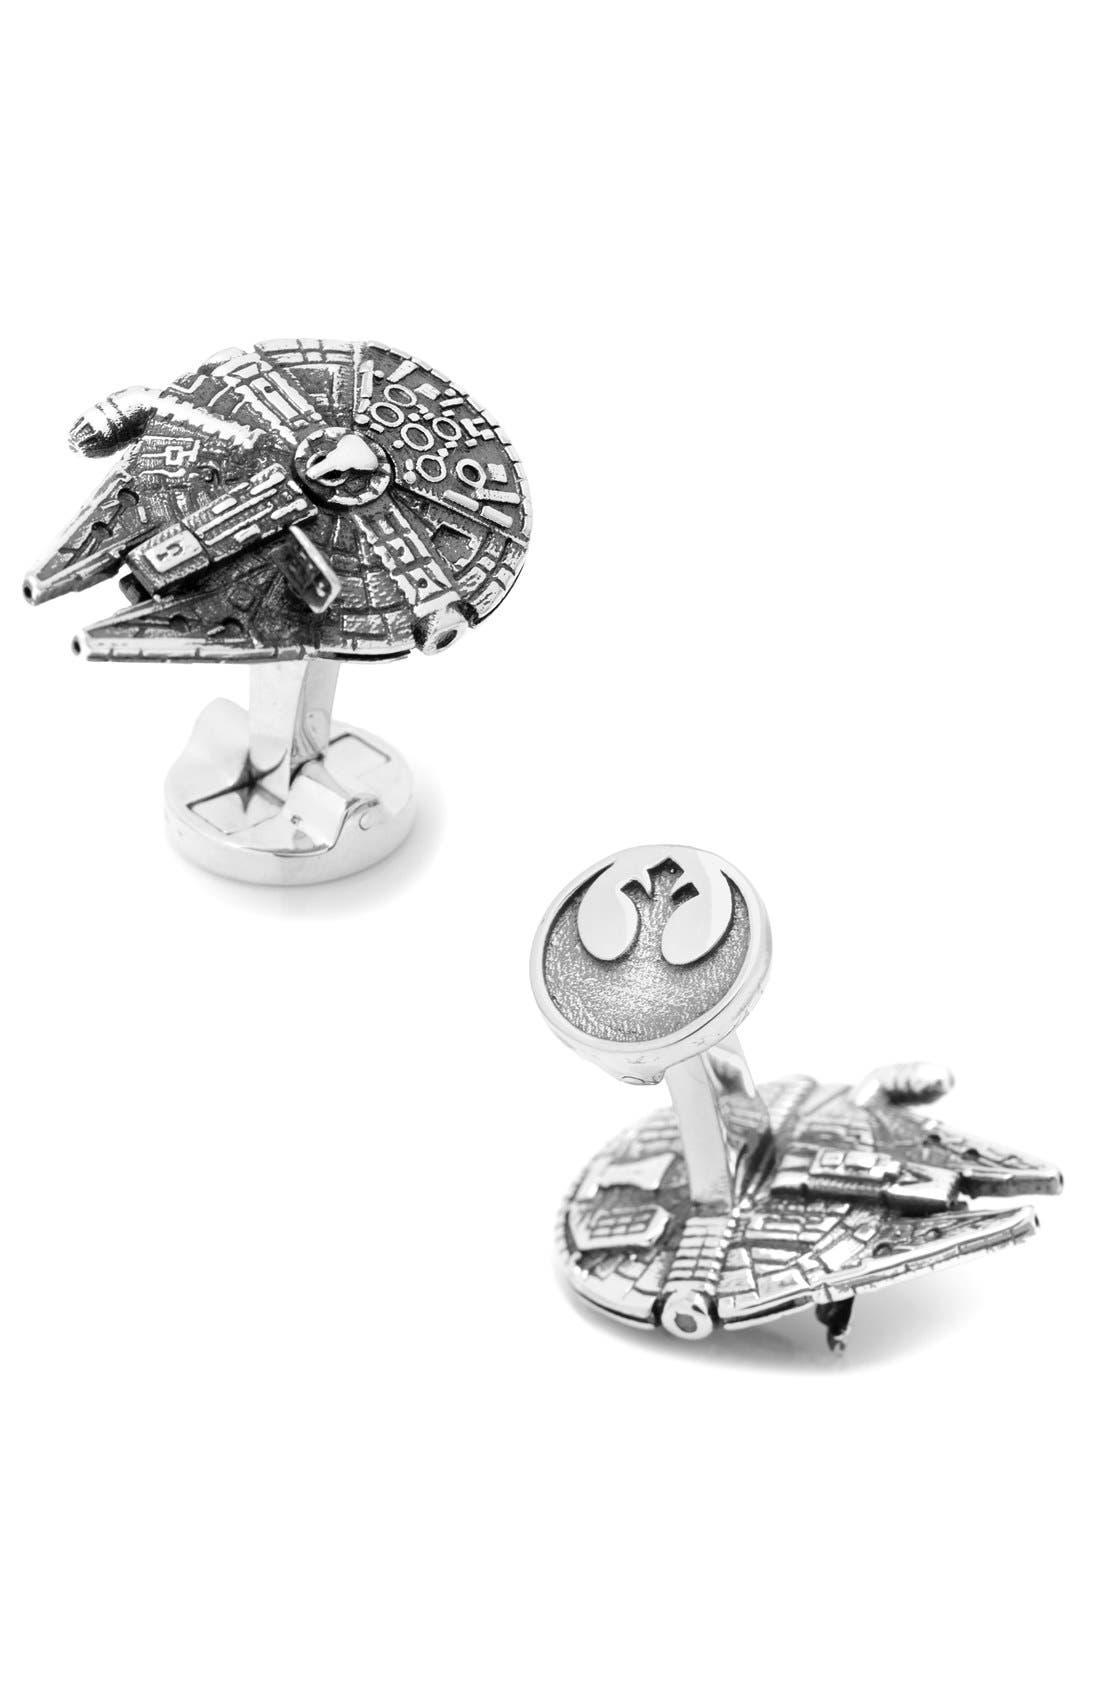 Star Wars Millennium Falcon Cuff Links,                             Main thumbnail 1, color,                             SILVER